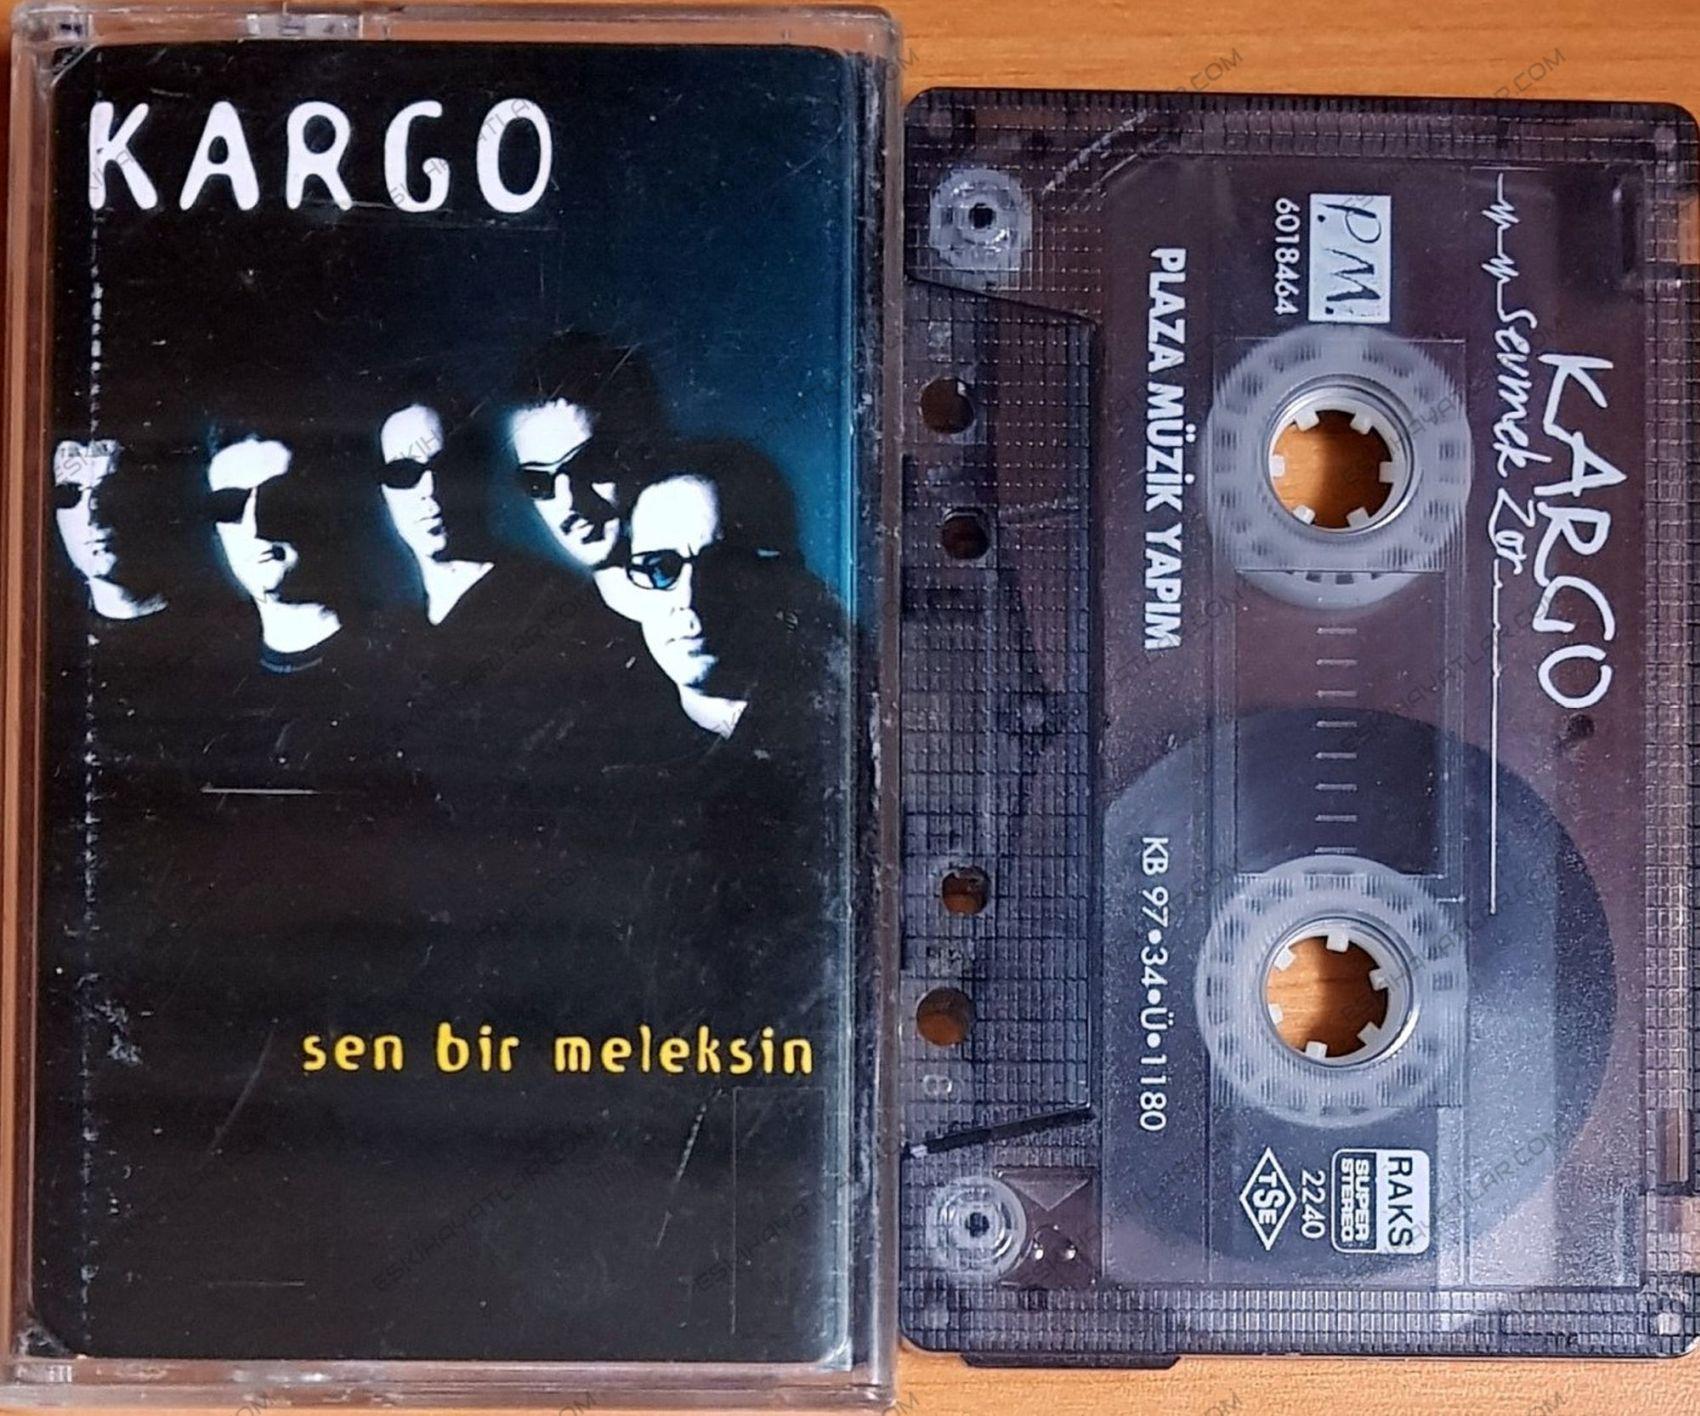 0262-kargo-grubu-2004-aktuel-roportaji-sevmek-zor-sairin-elinde (1)